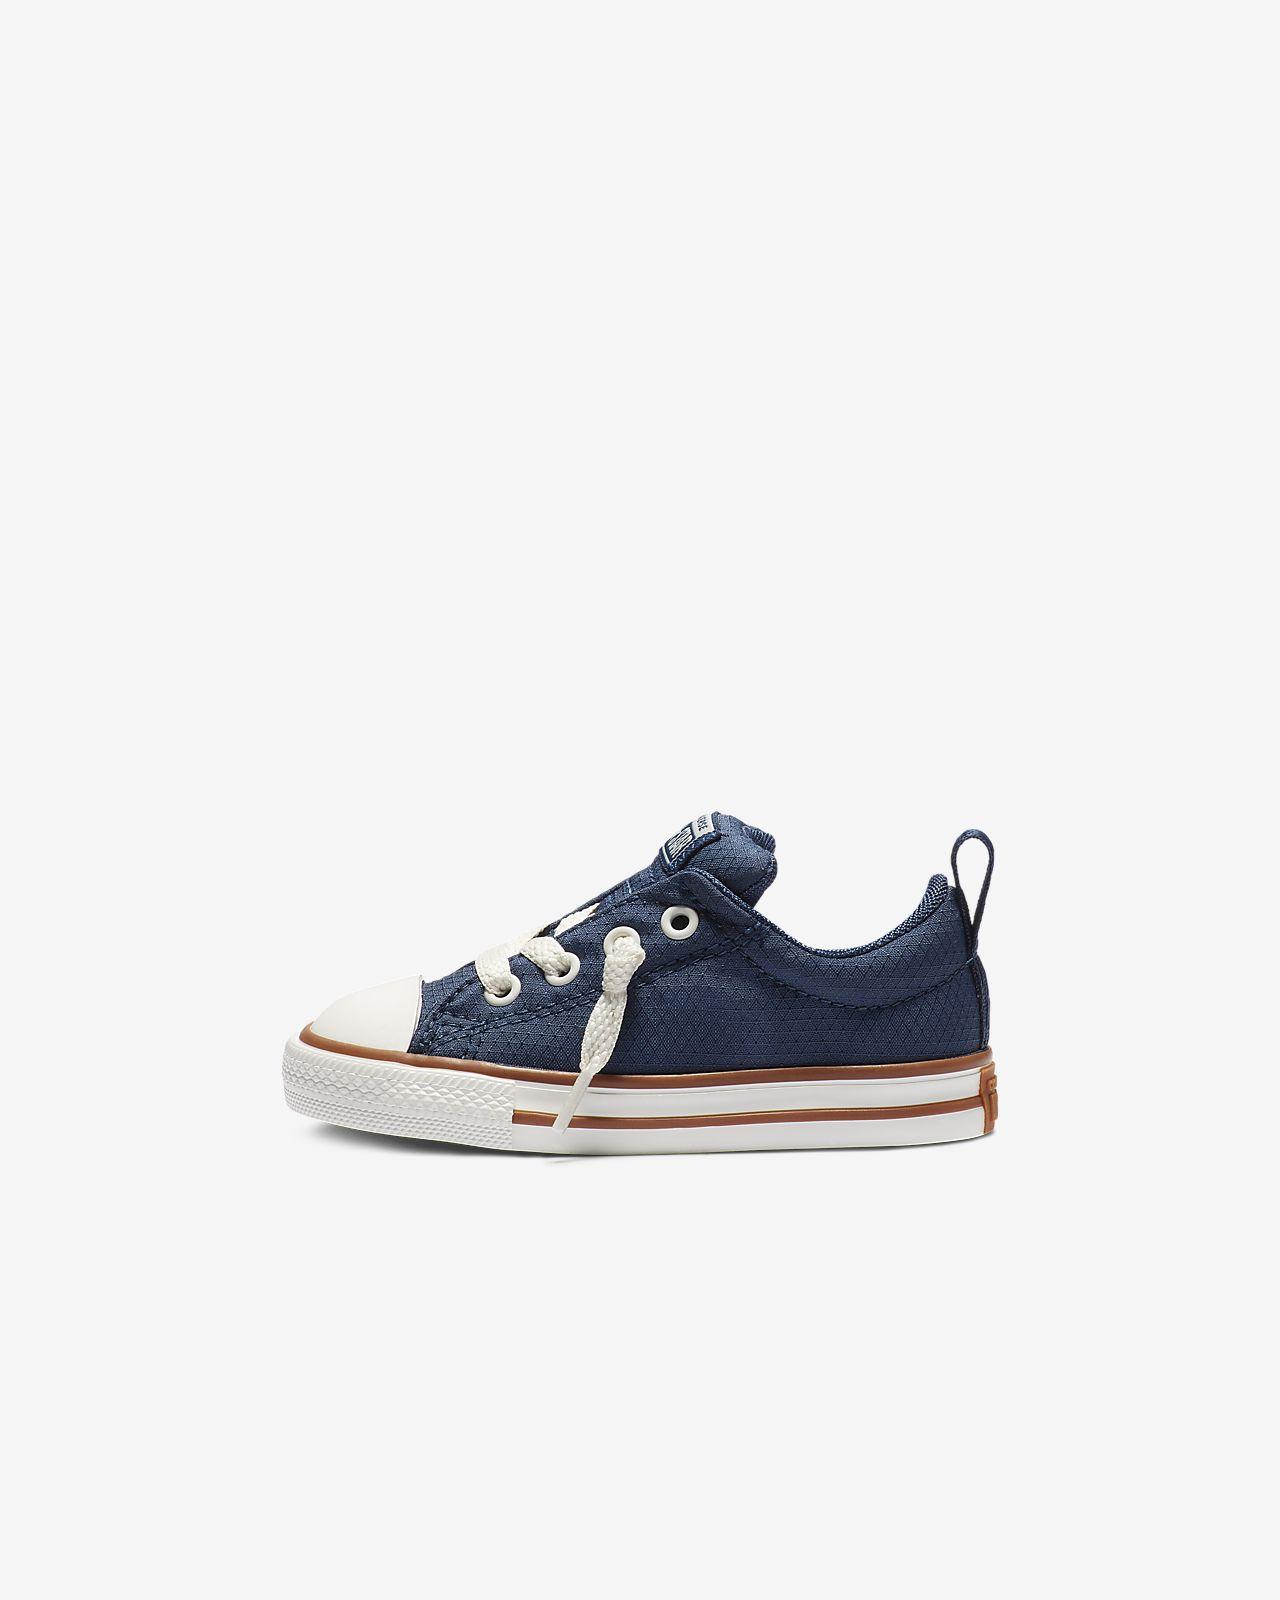 Converse Chuck Taylor All Star Street Pinstripe Toddler Shoe